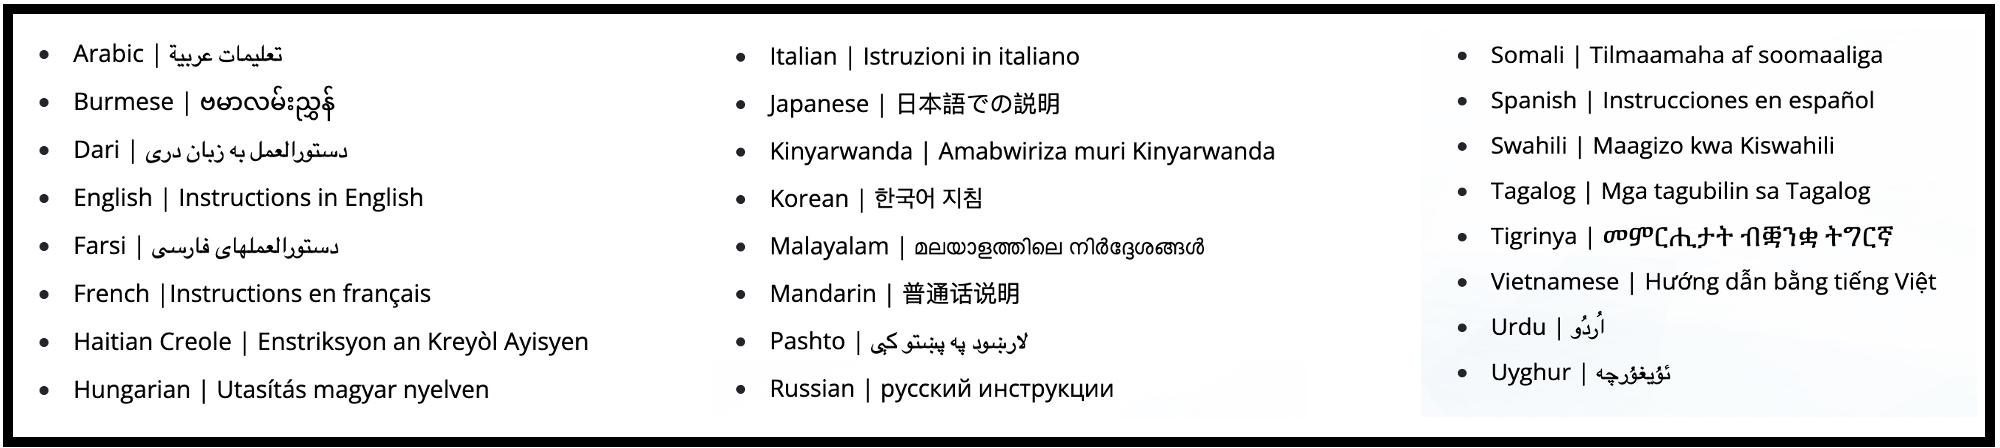 TARJIMLY volunteers help with many languages